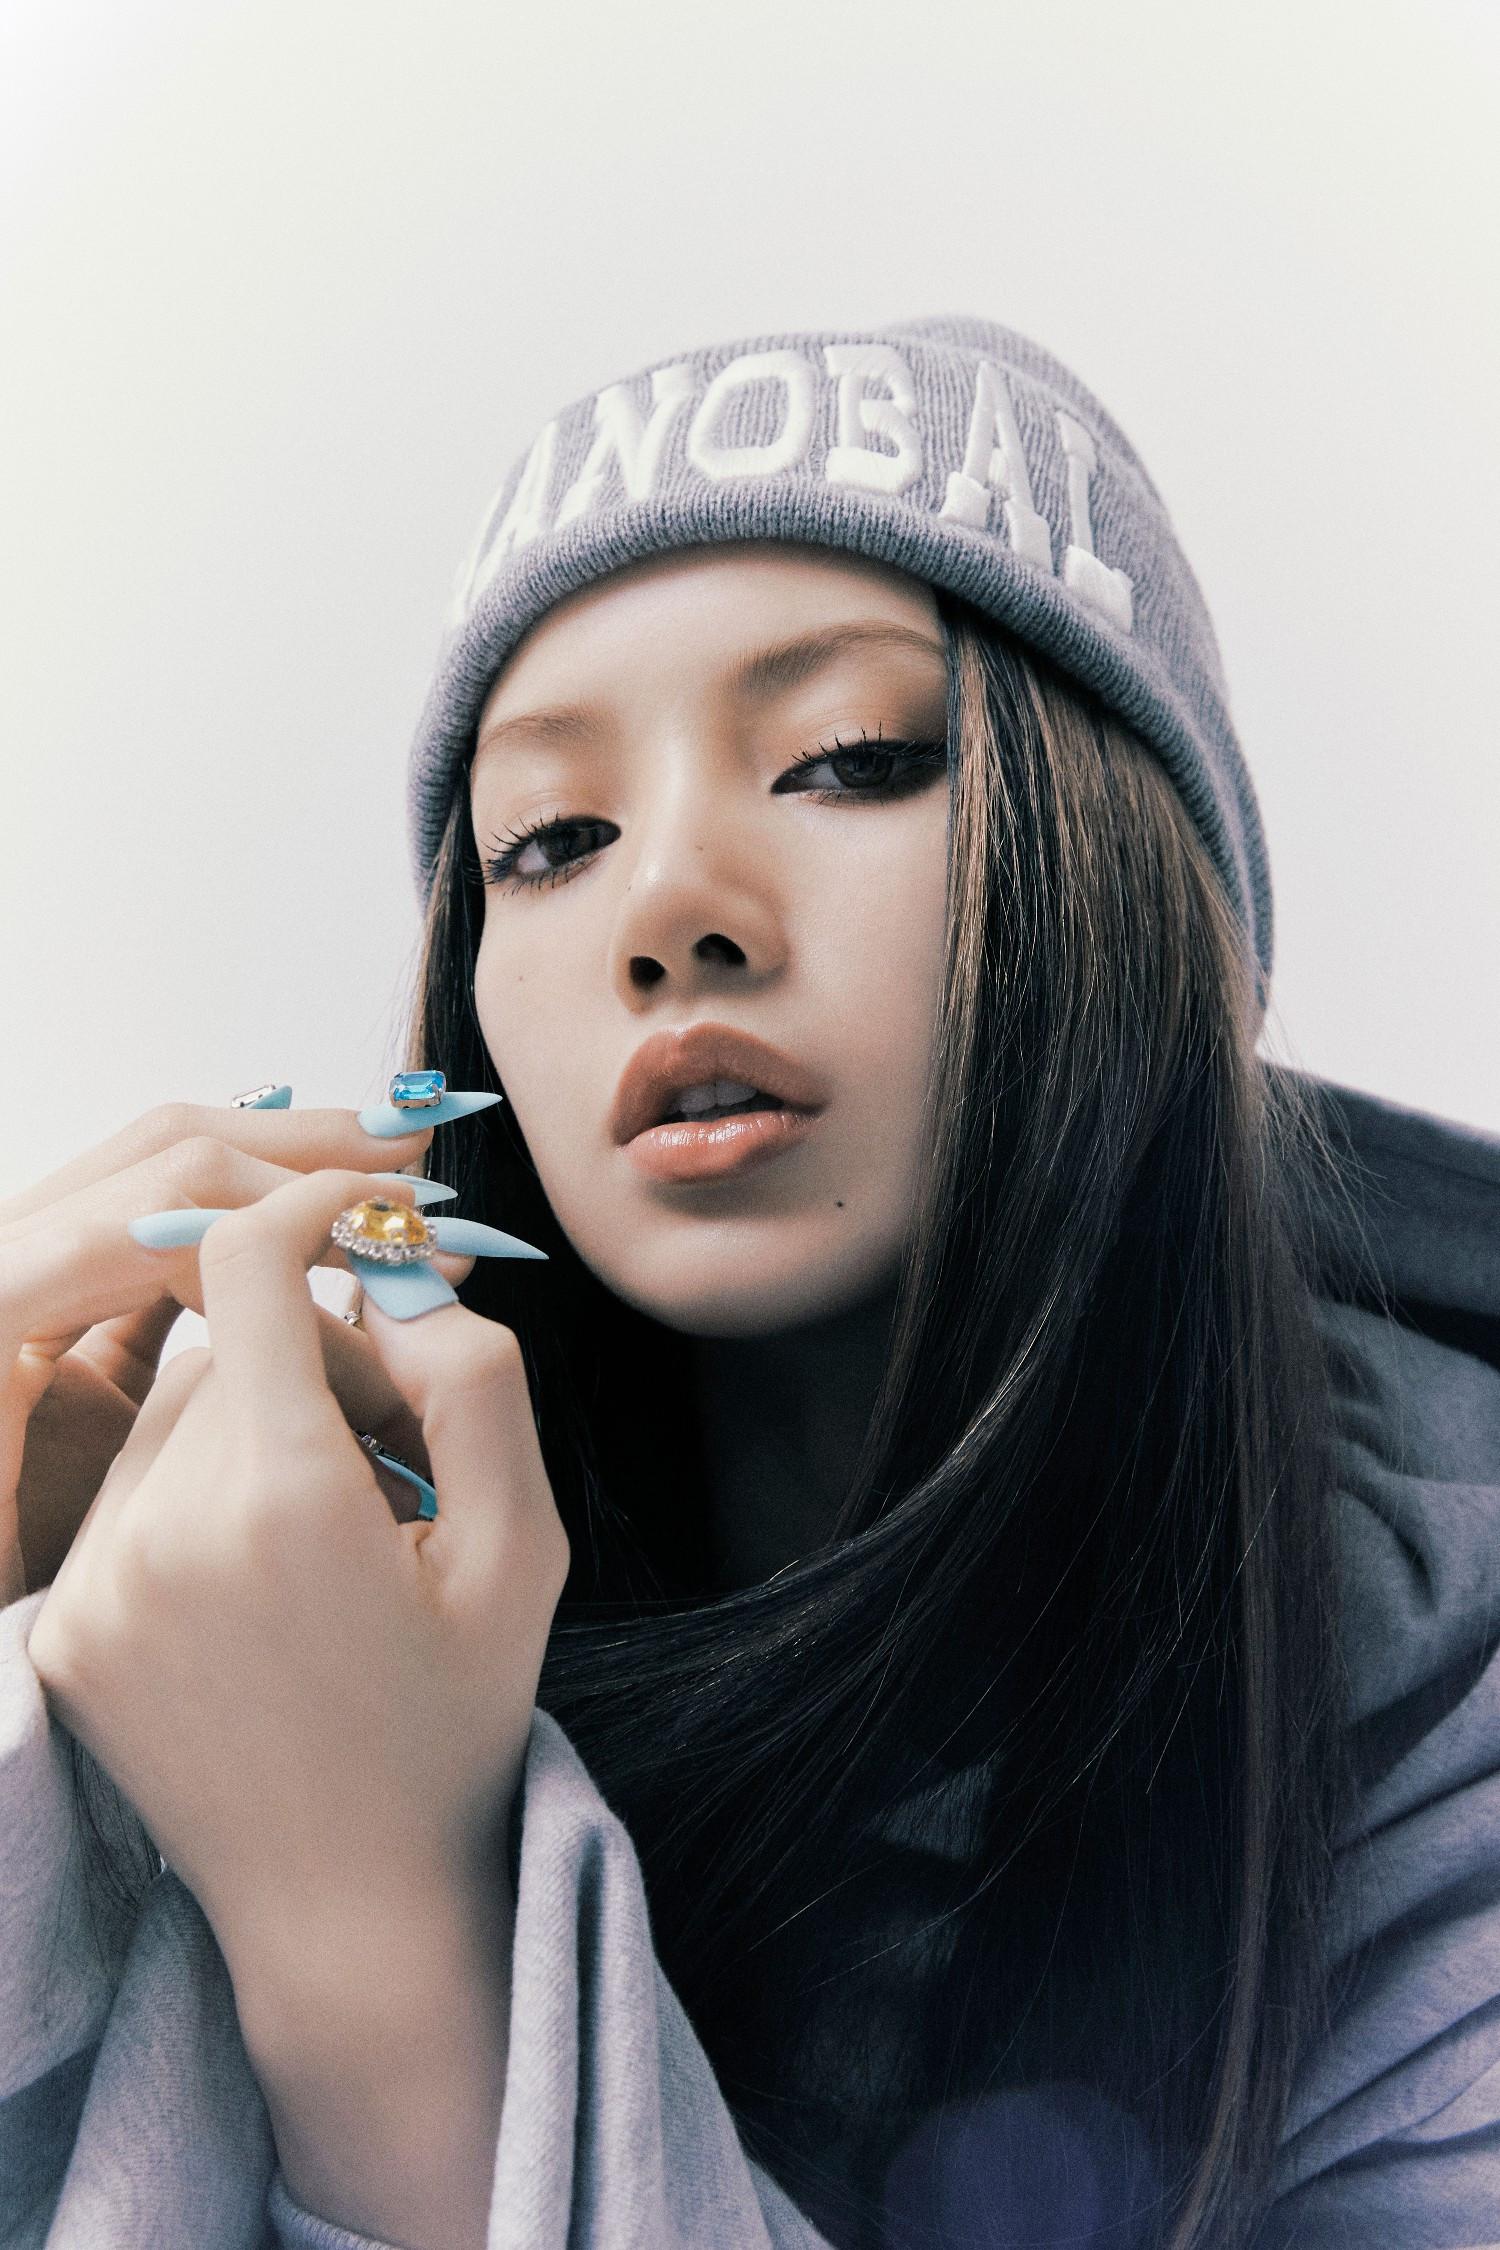 Blackpink Lisa Lalisa Concept Photos (HD/HQ) - K-Pop Database / dbkpop.com